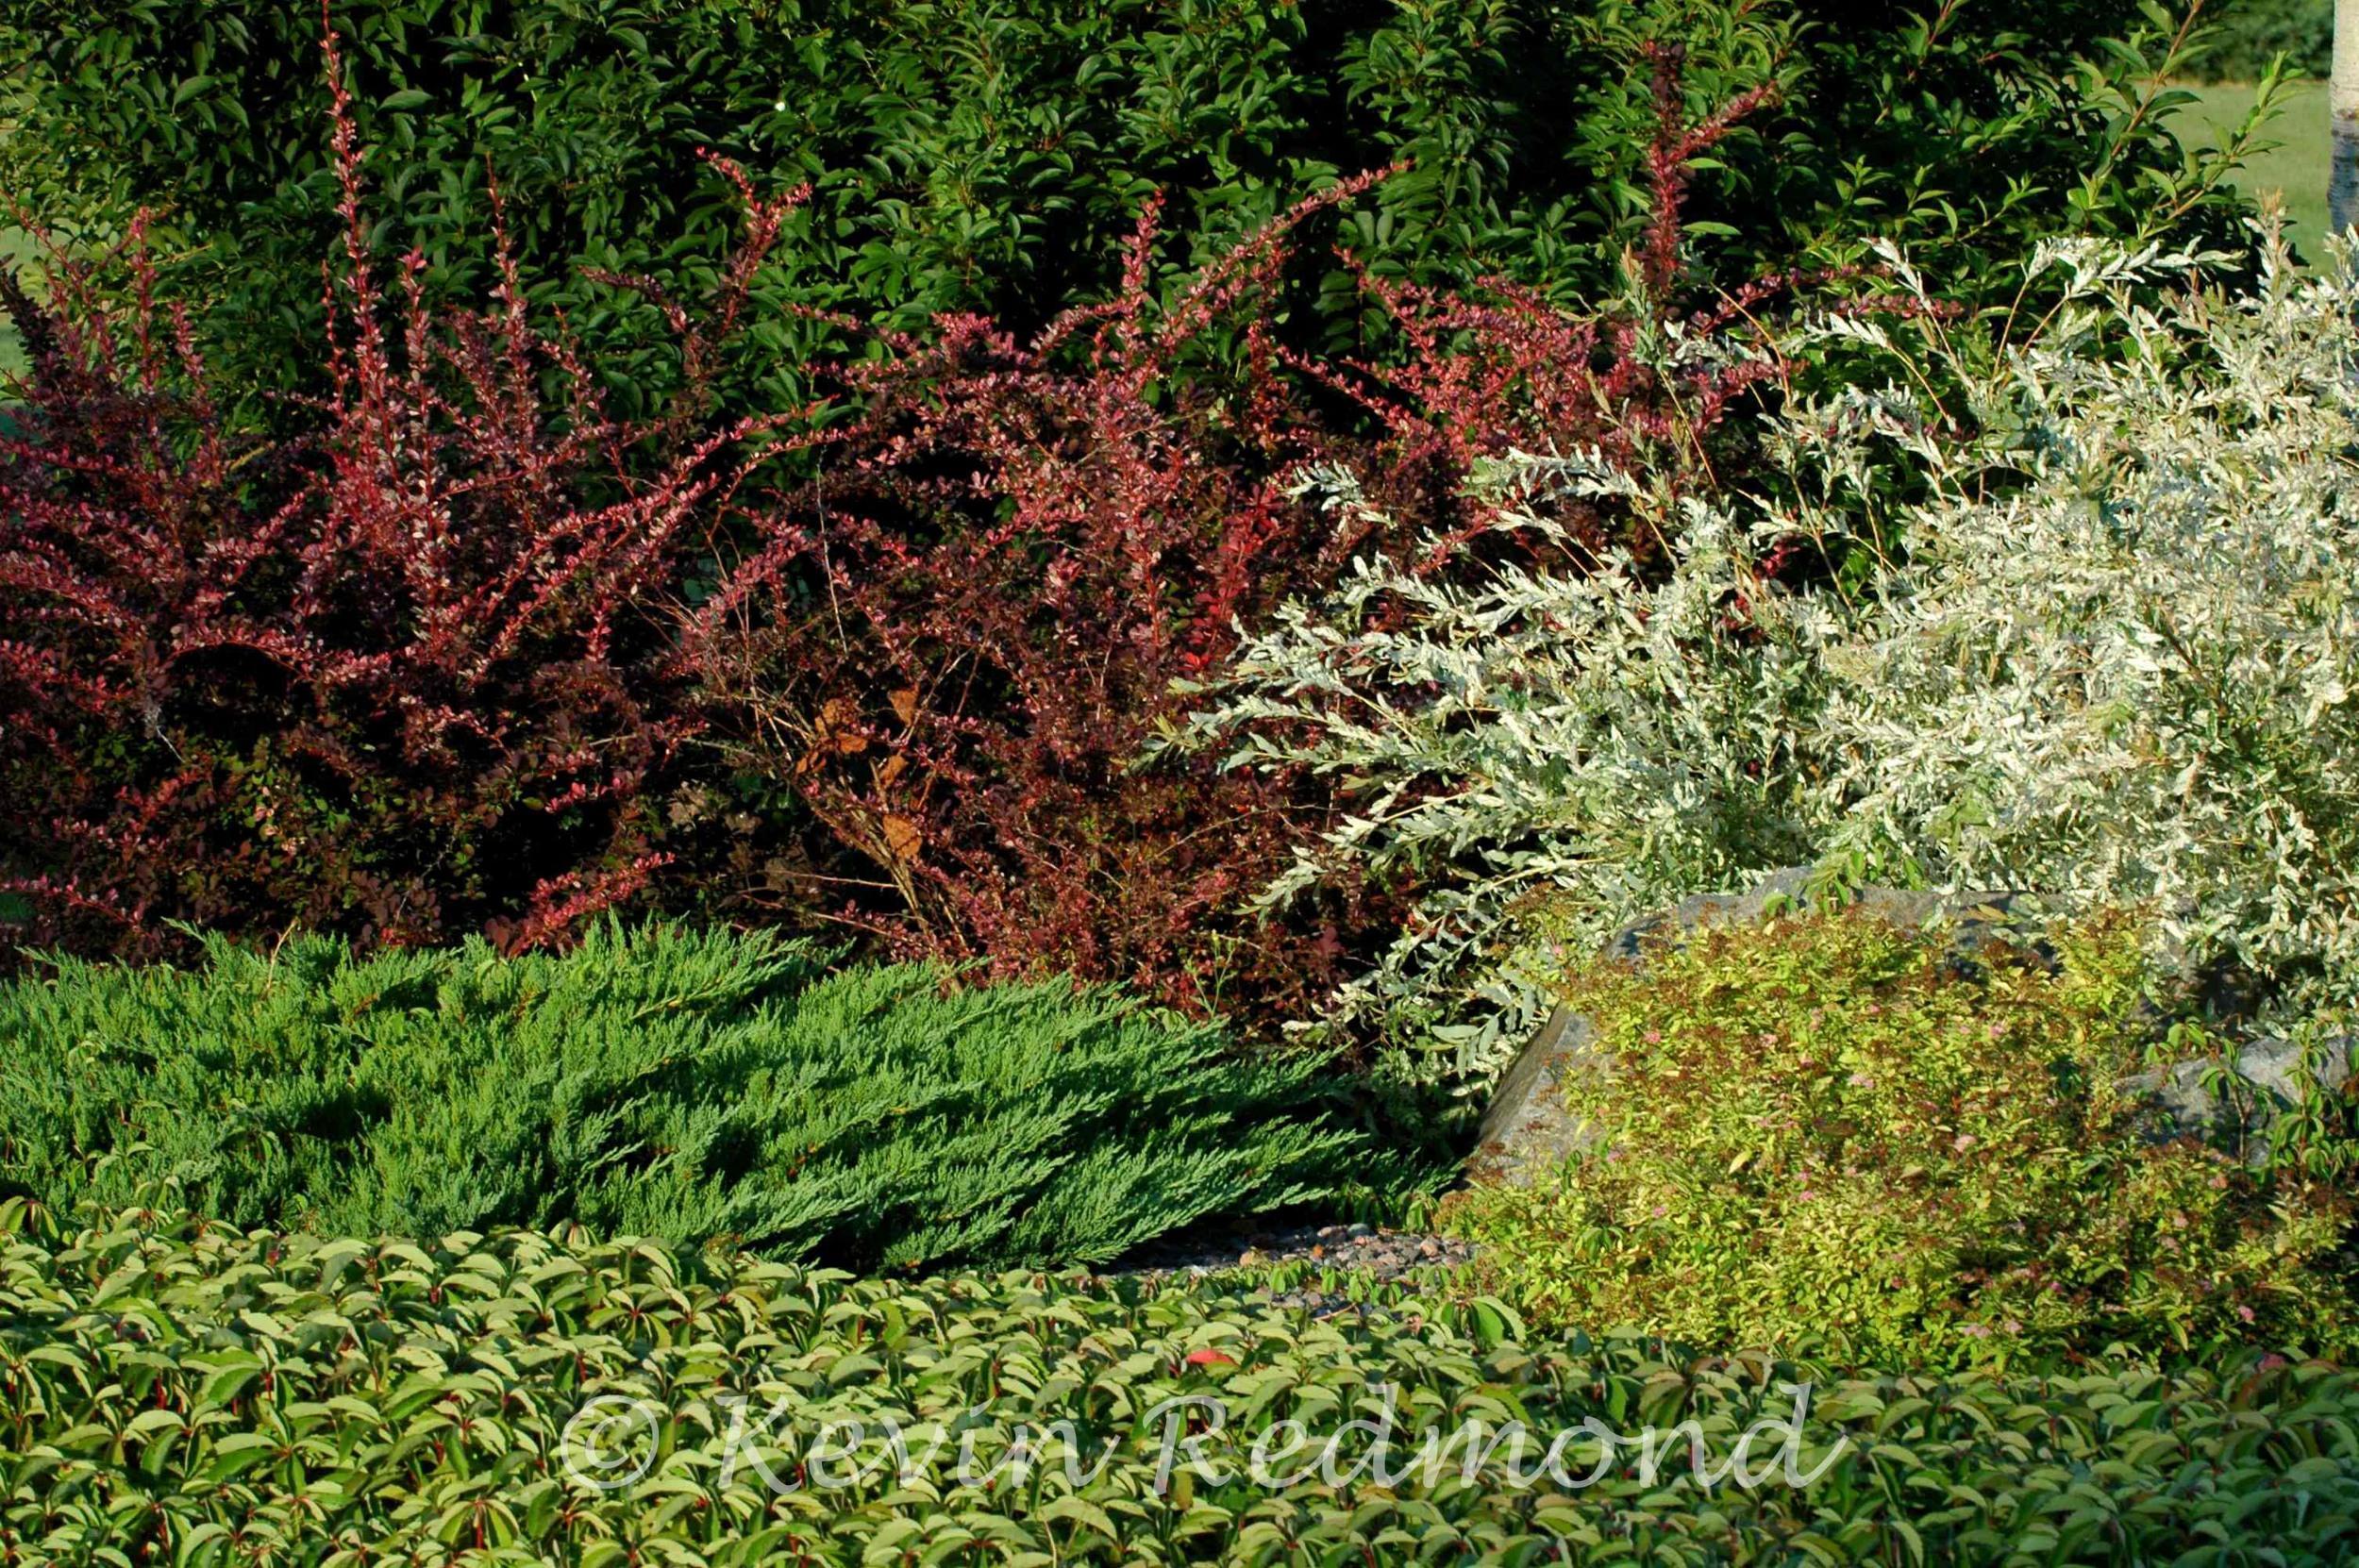 Flora1-5.jpg